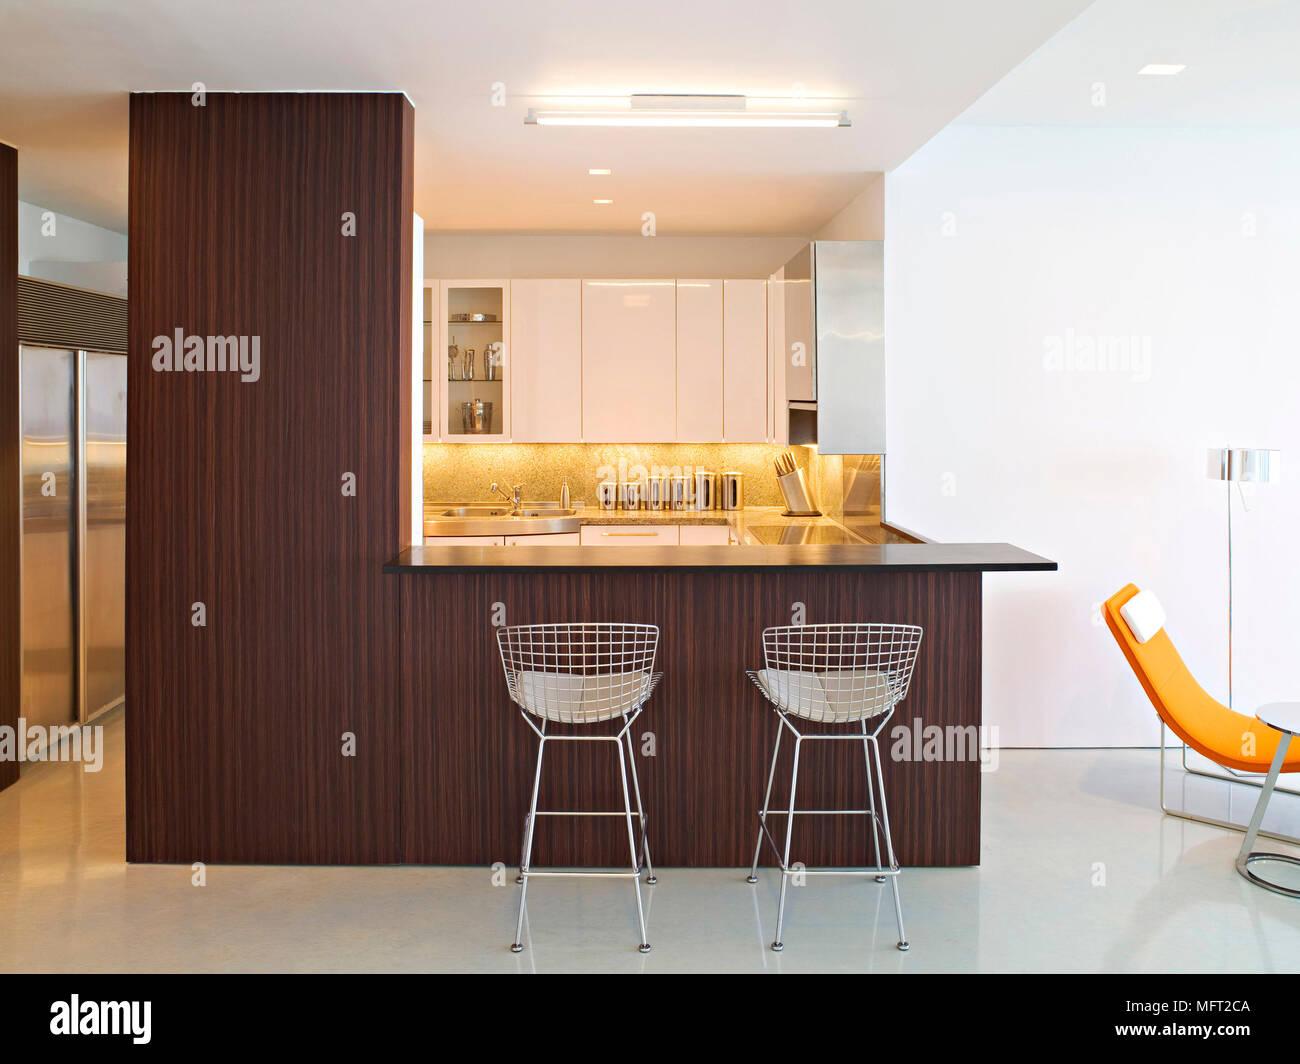 Una moderna cucina bianca legno bar per la prima colazione unità